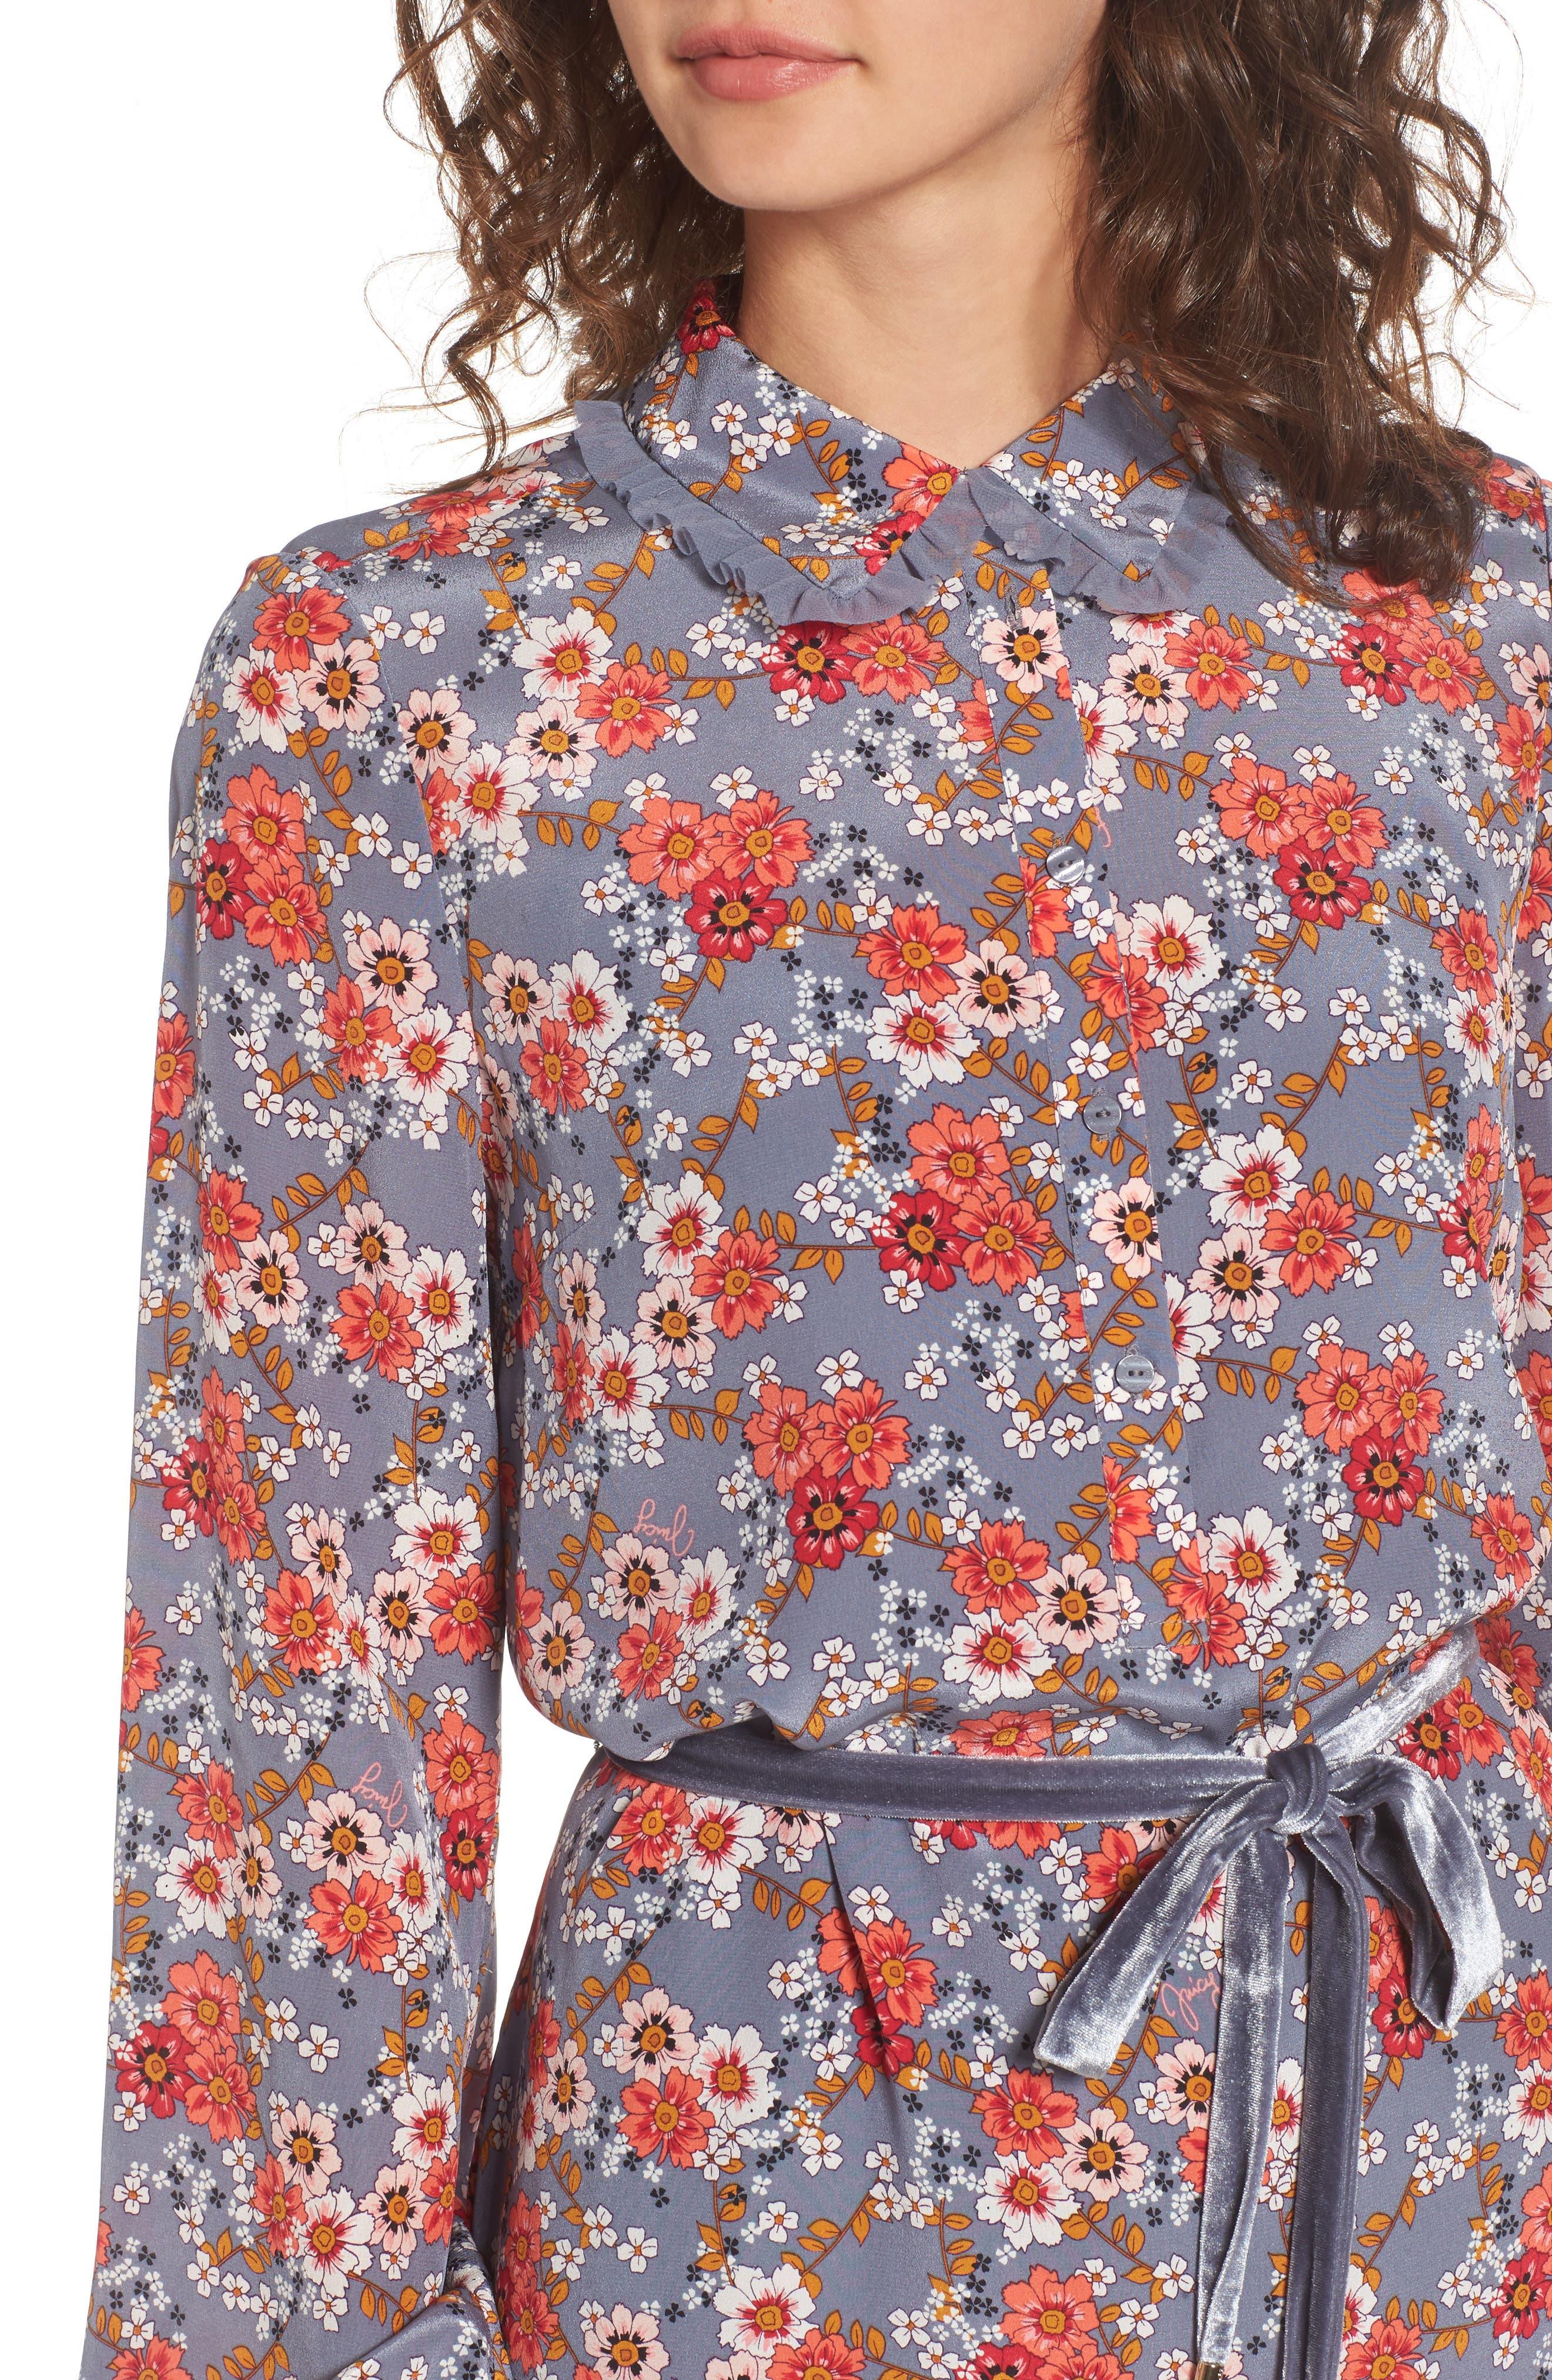 Larchmont Blooms Silk Shirtdress,                             Alternate thumbnail 4, color,                             Slate Swirl Larchmonth Blooms